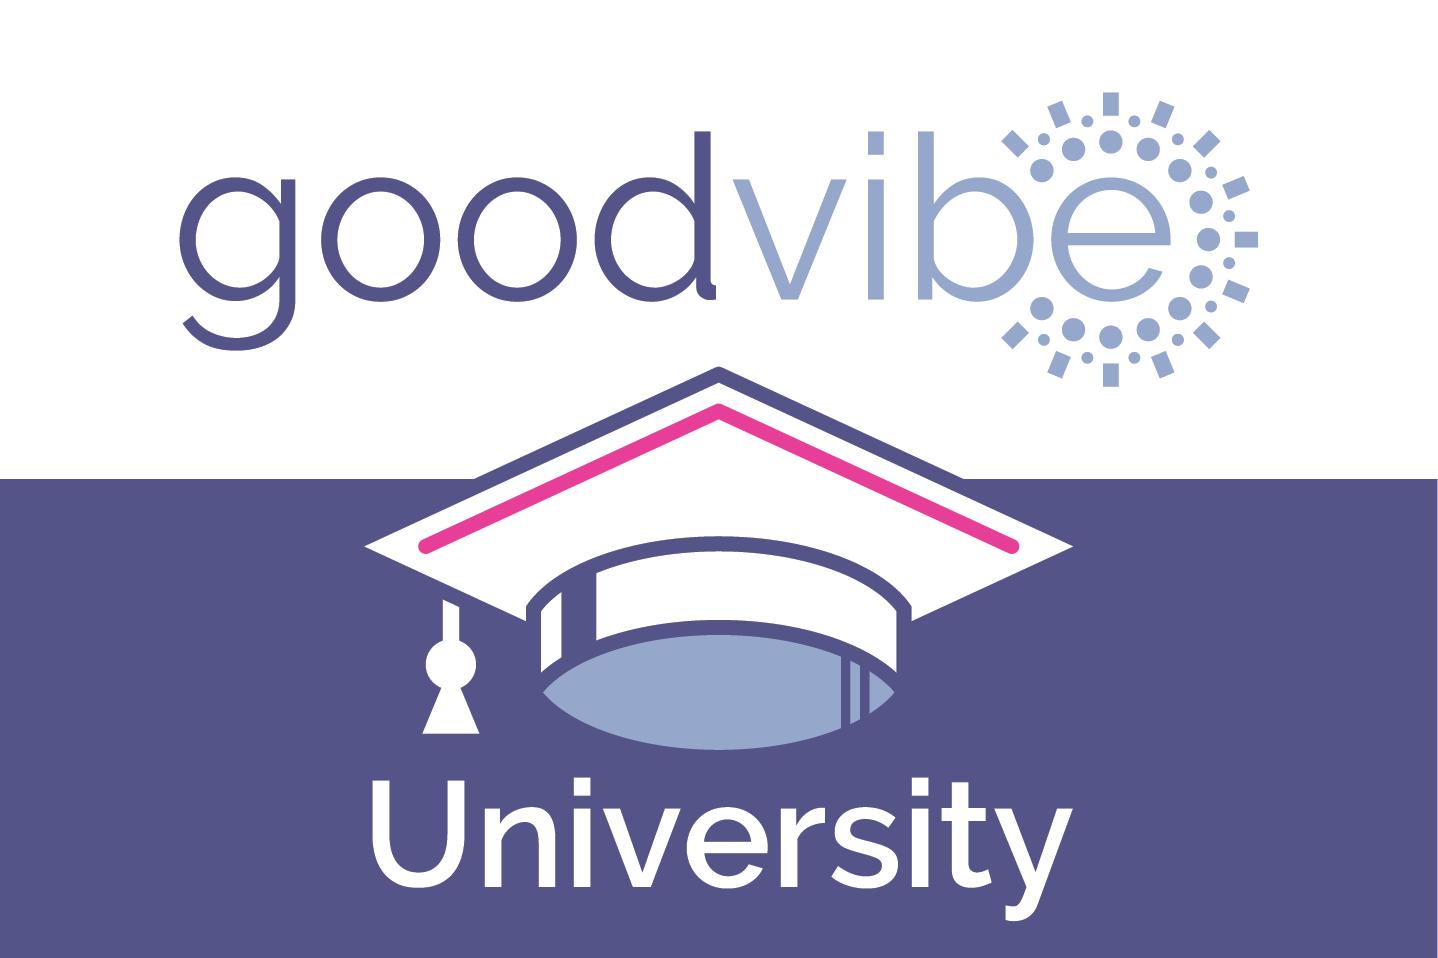 goodvibe university